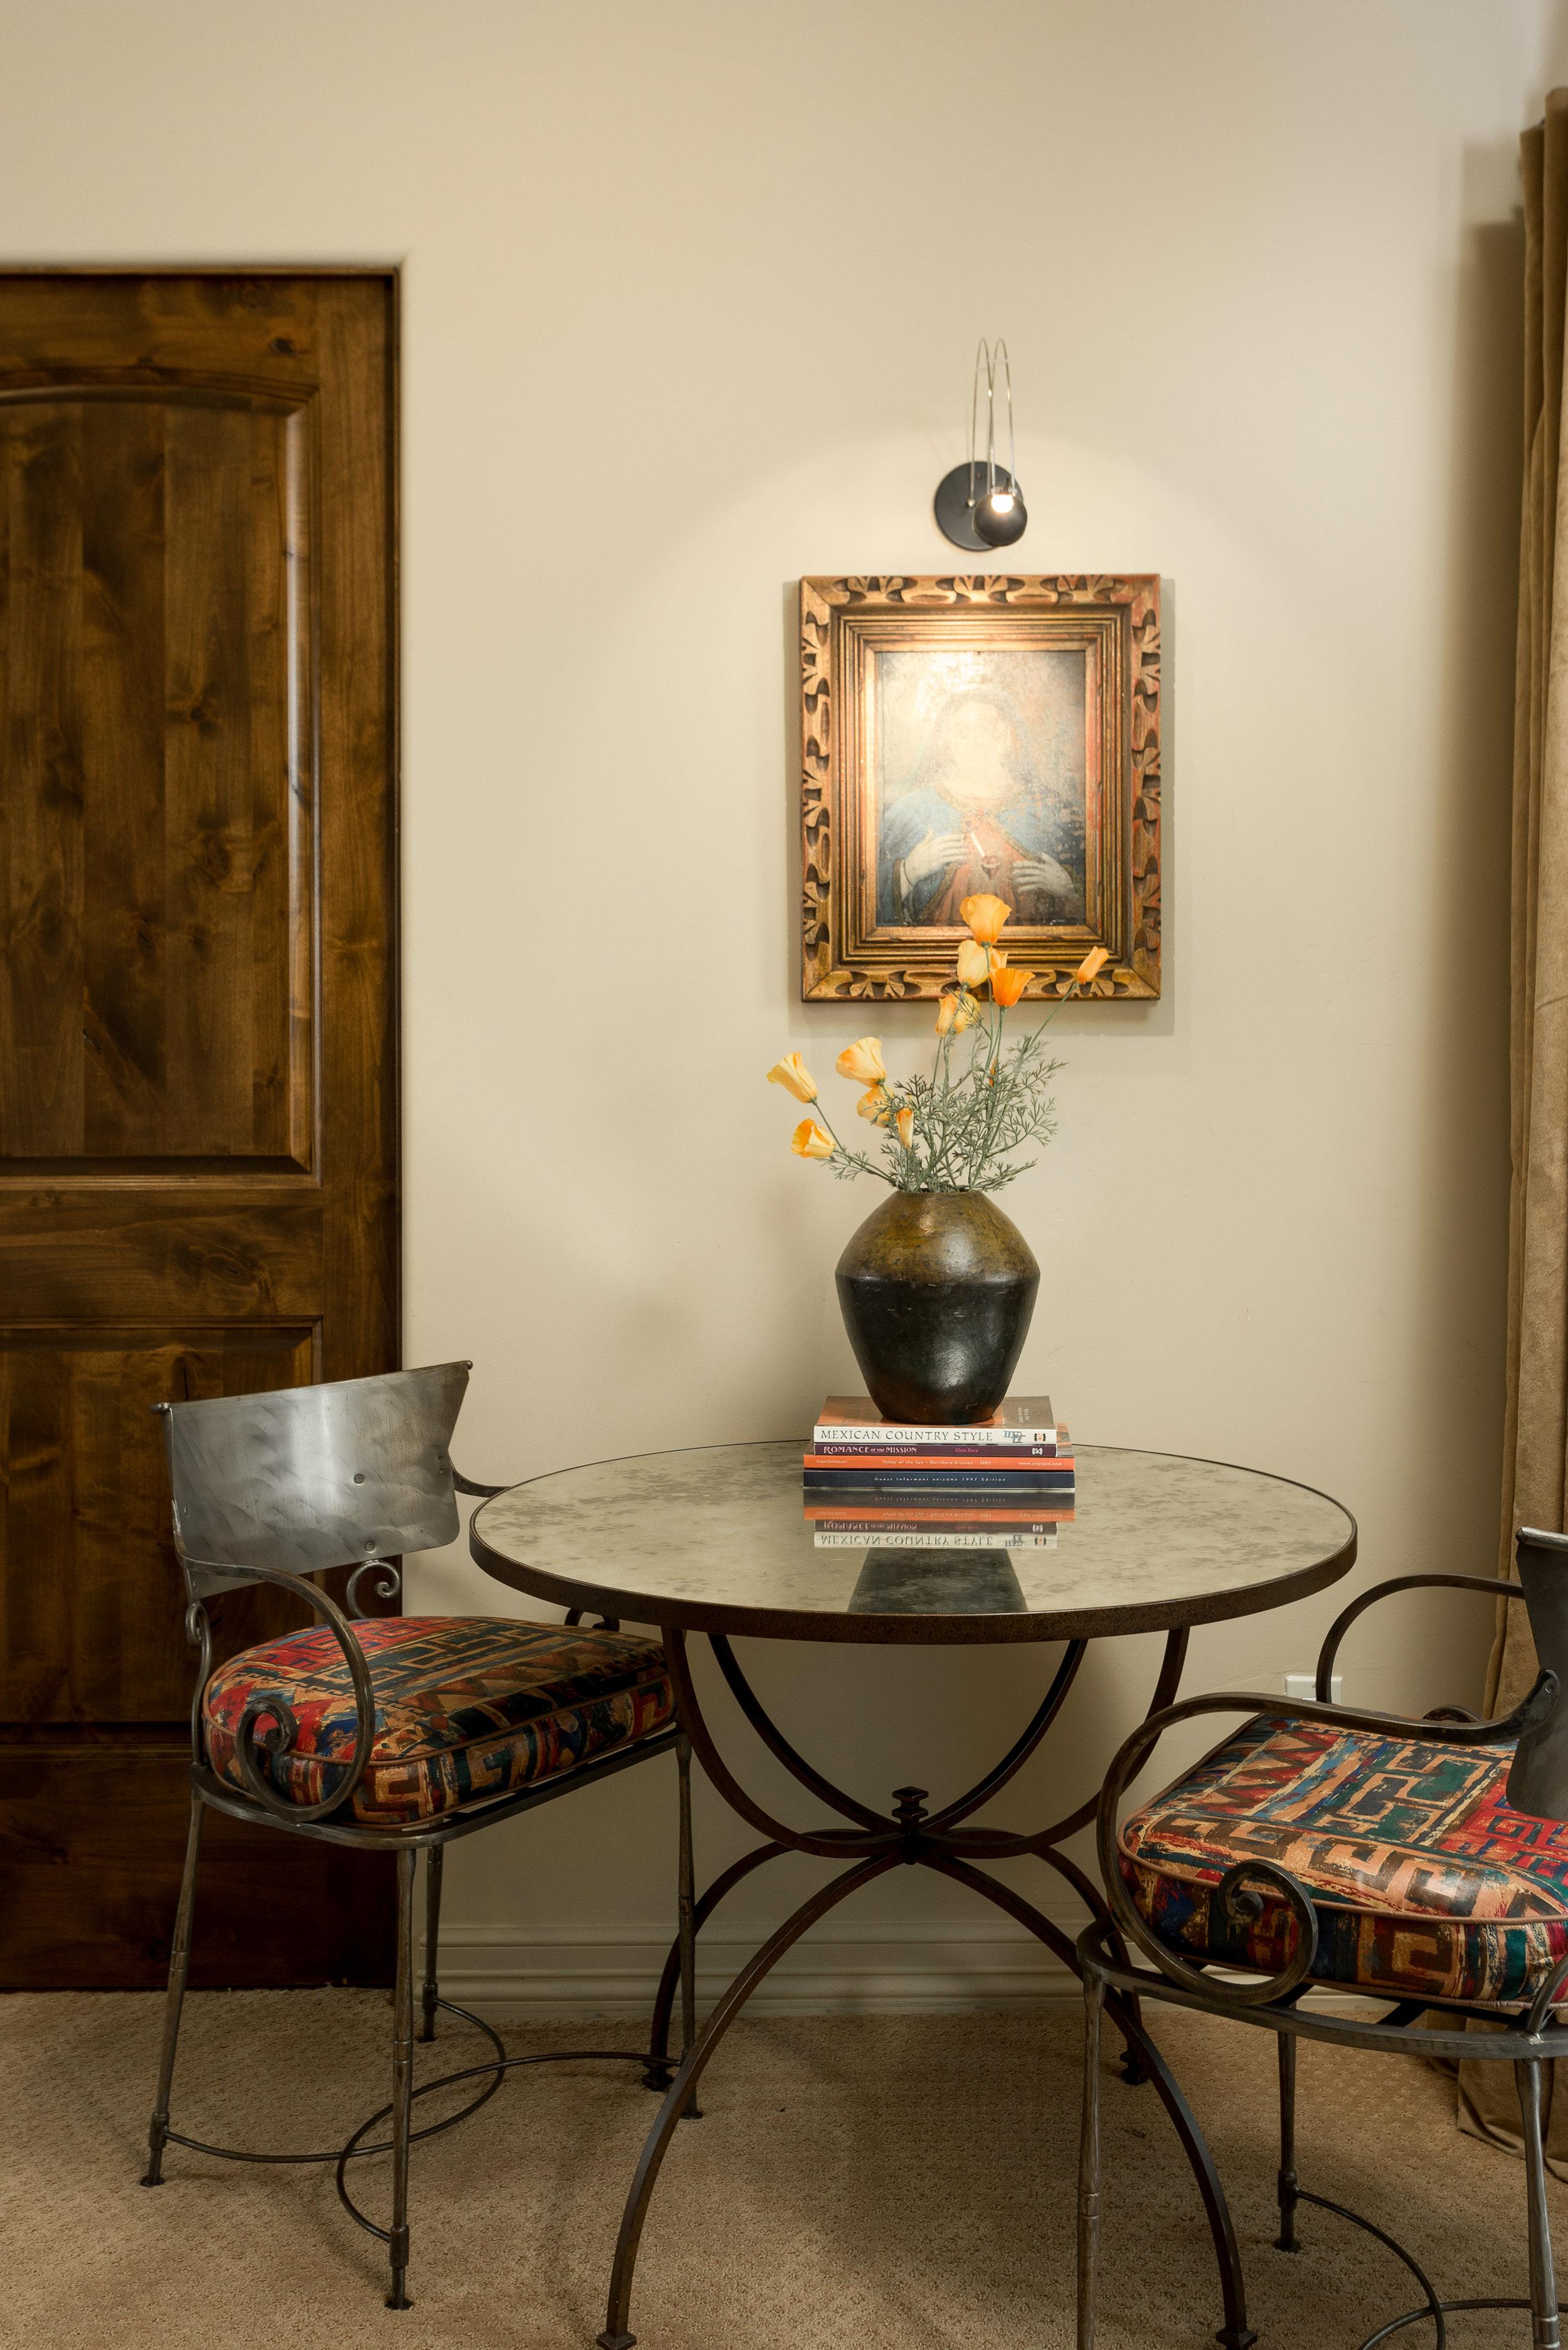 Popix+Designs+-+Traditional+Design+meets+Southwestern+Design-2 copy.jpeg